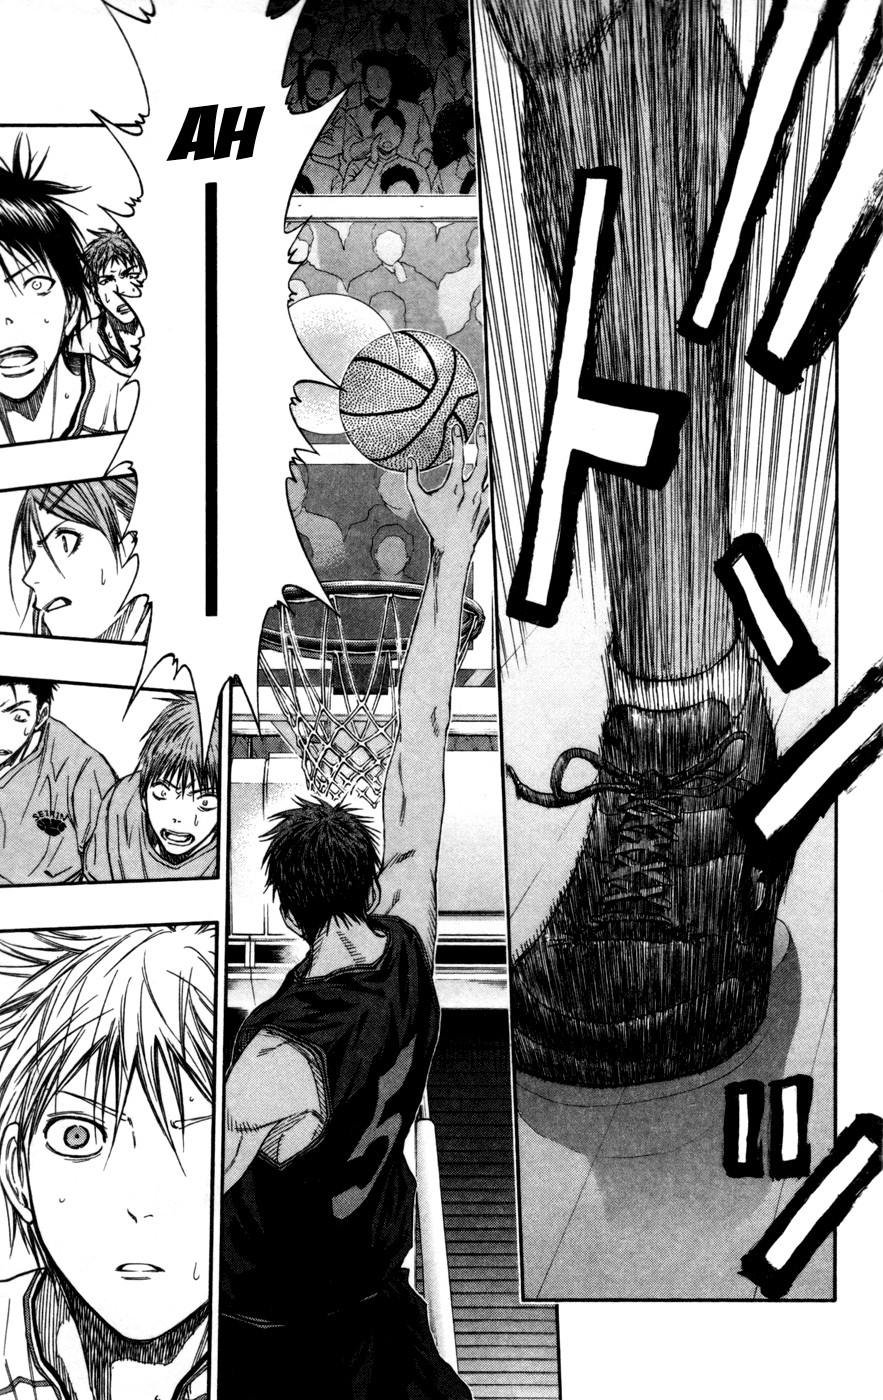 Kuroko no Basket Manga Chapter 115 - Image 12